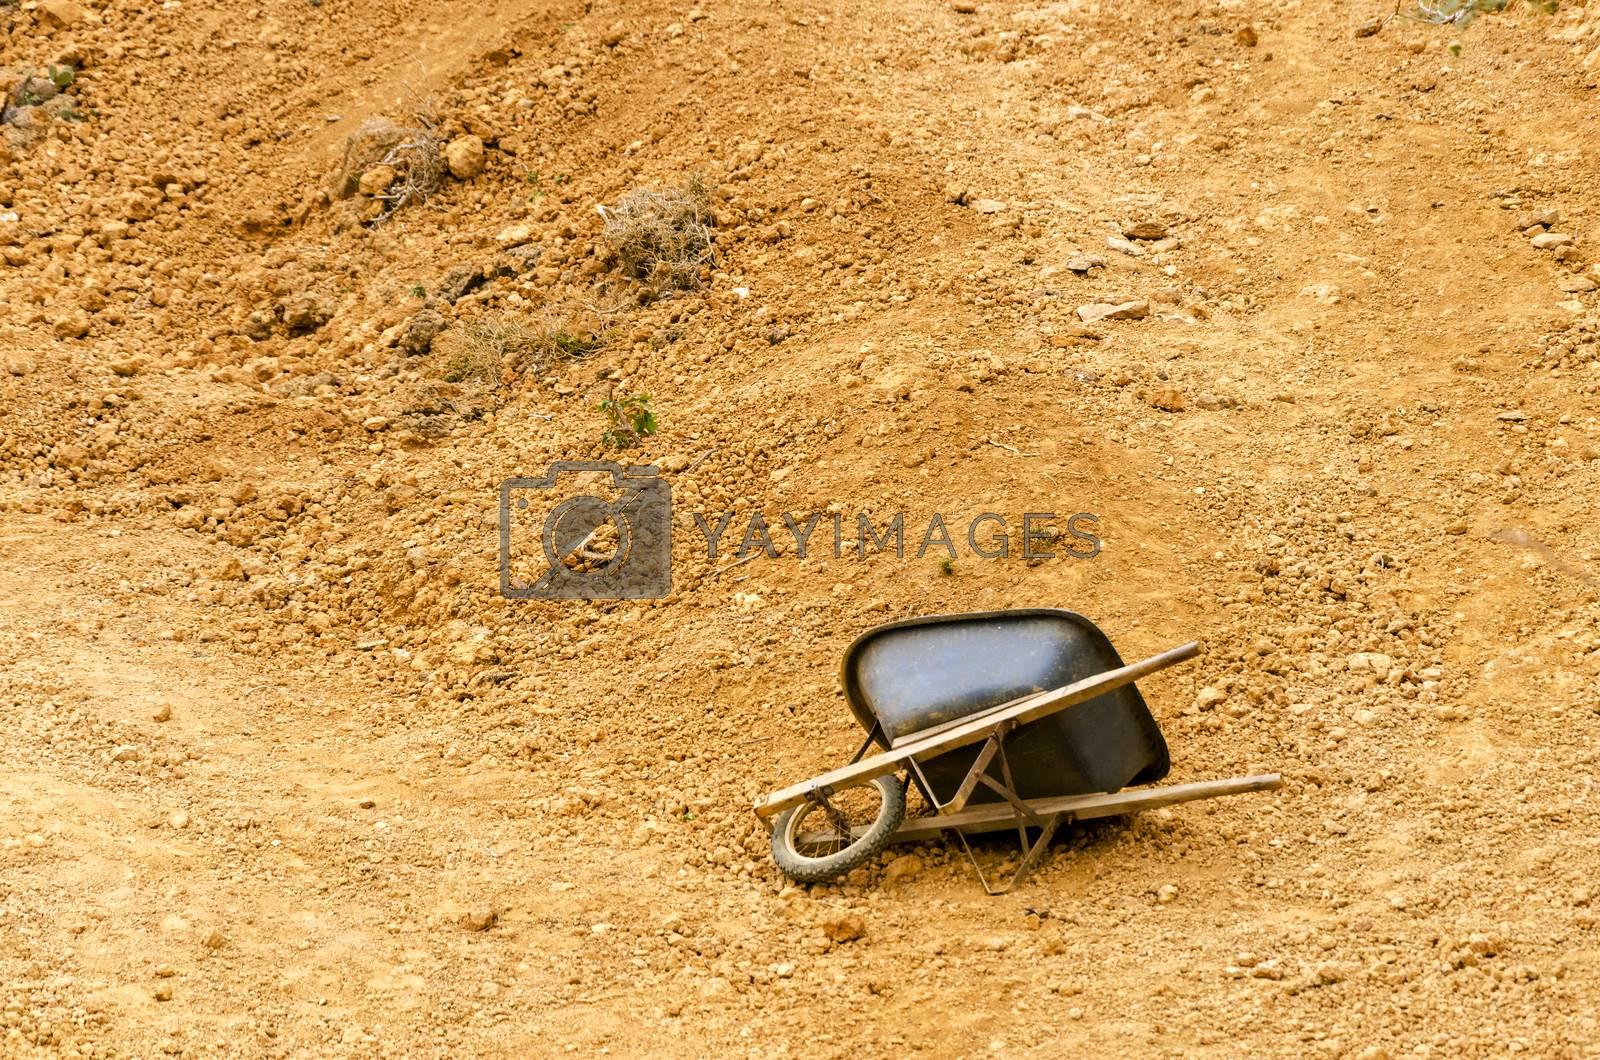 Black wheelbarrow in a dry barren setting